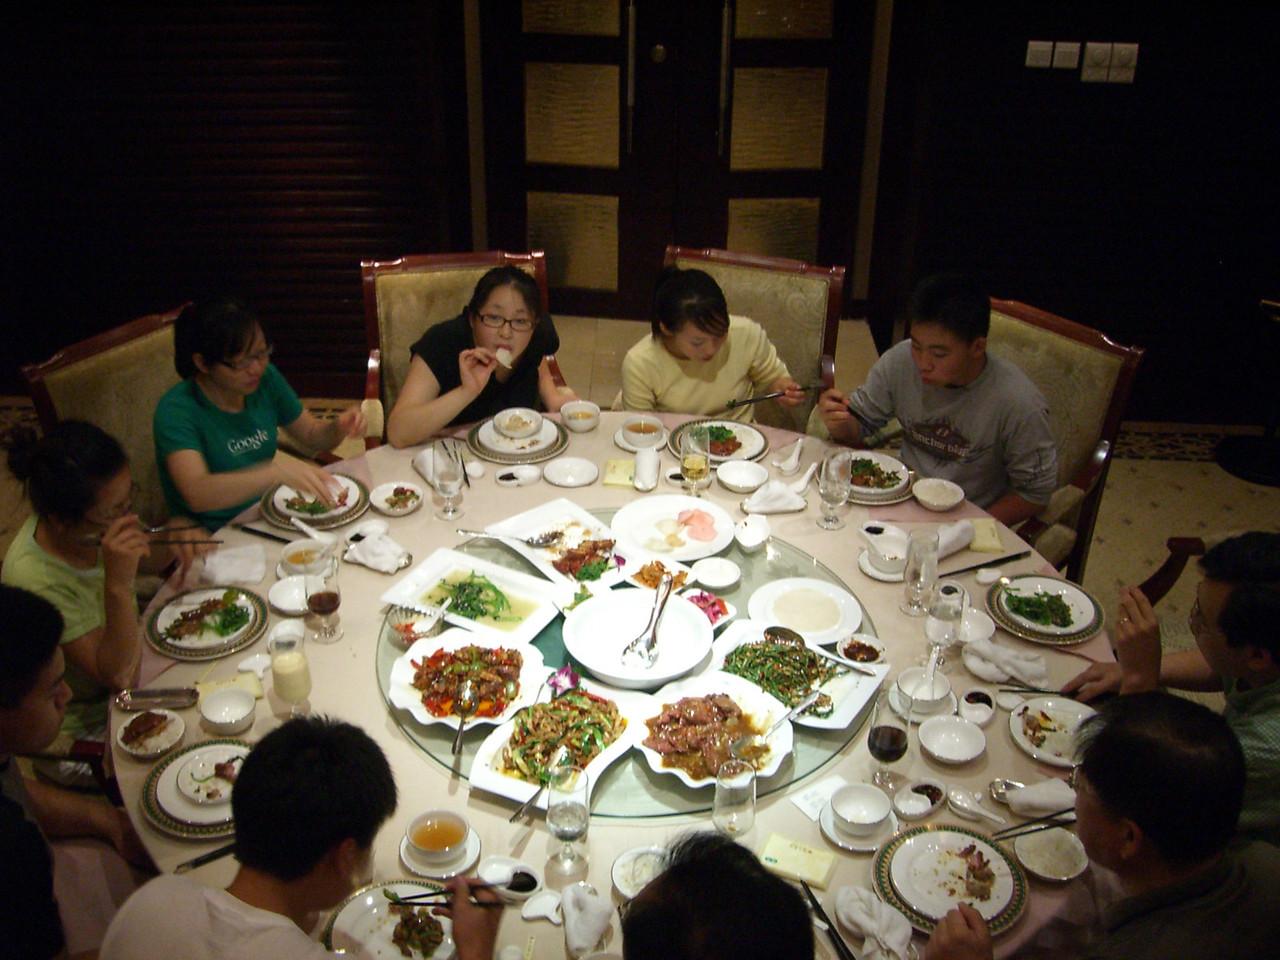 2006 07 14 Fri - Private banquet room 2